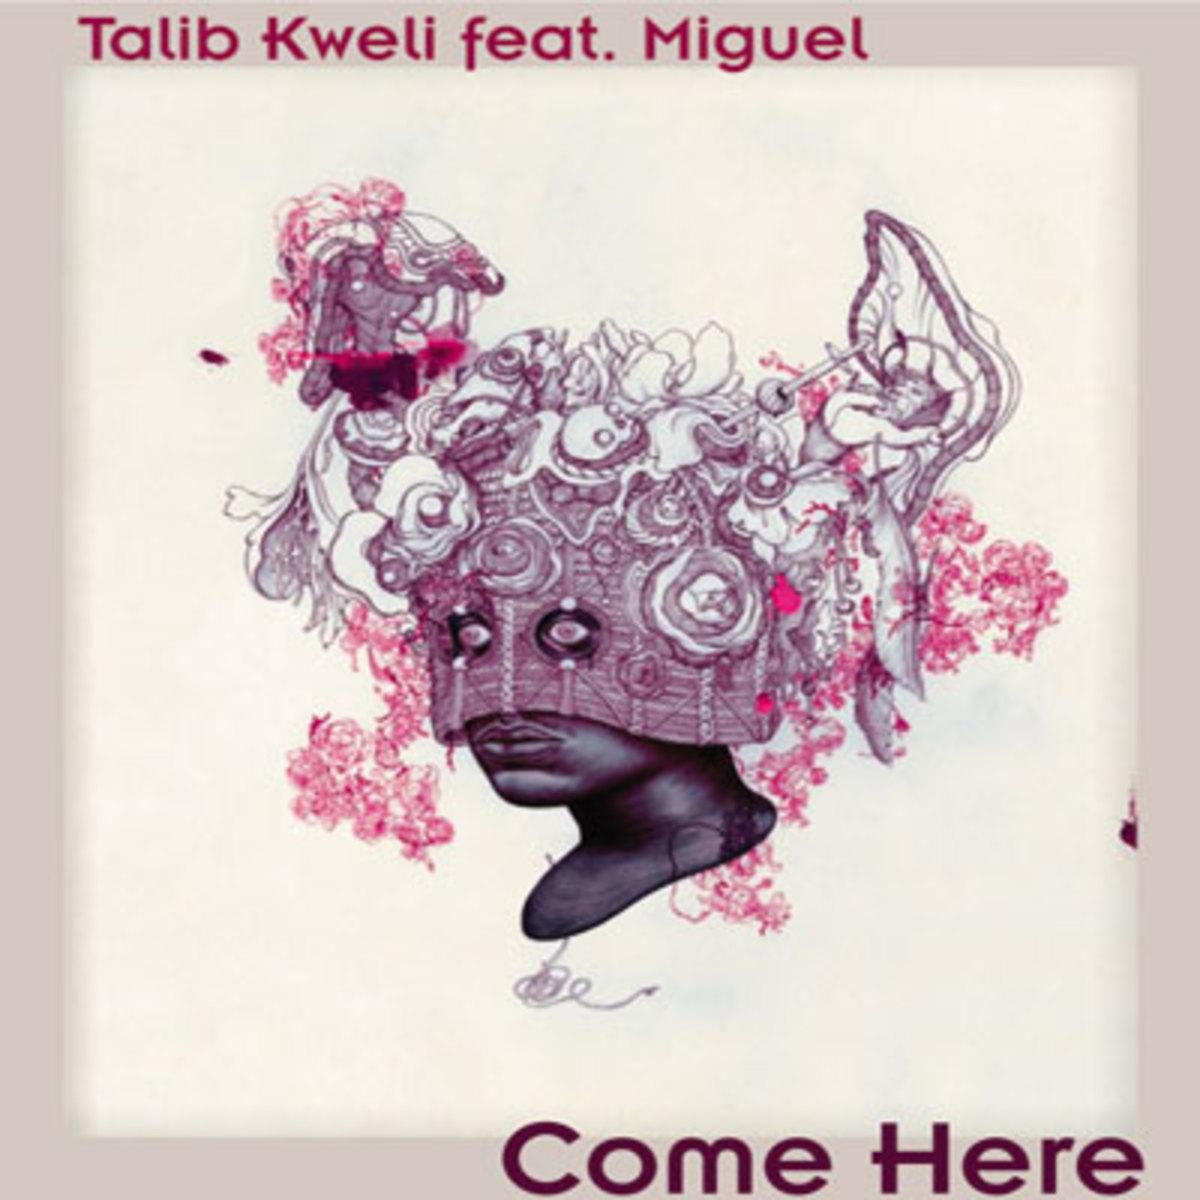 talibkweli-comehere.jpg